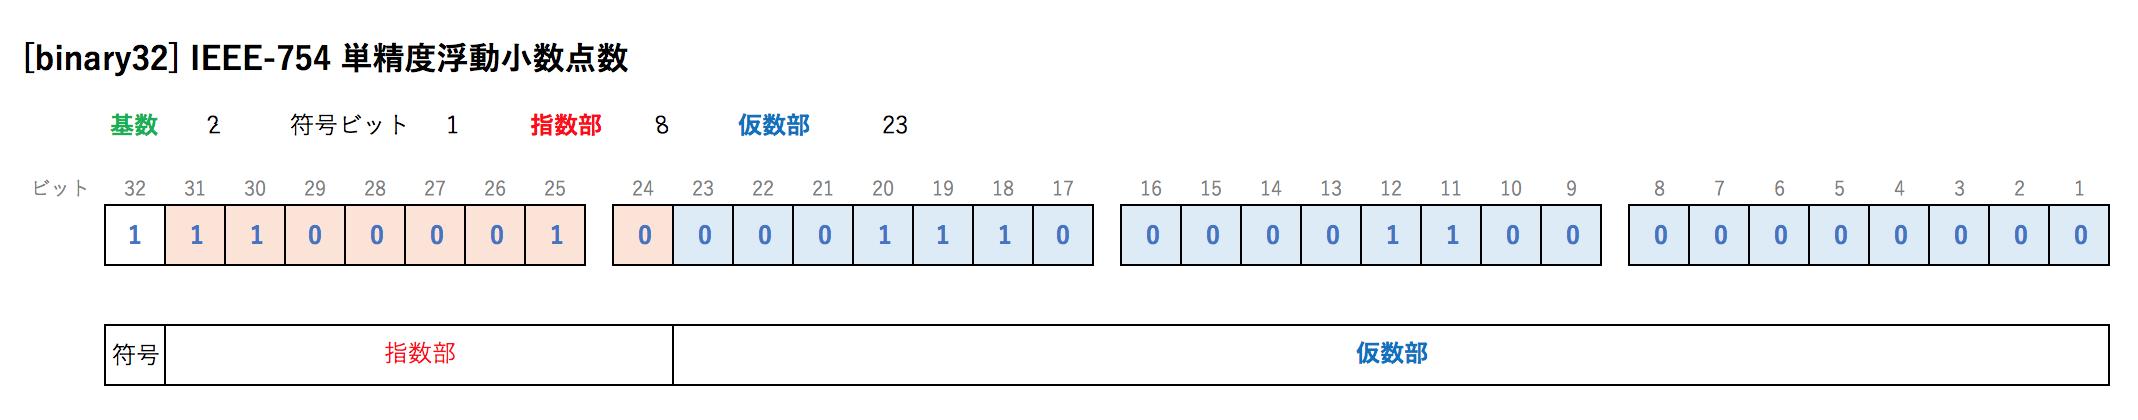 [binary32] IEEE-754 単精度浮動小数点数.png